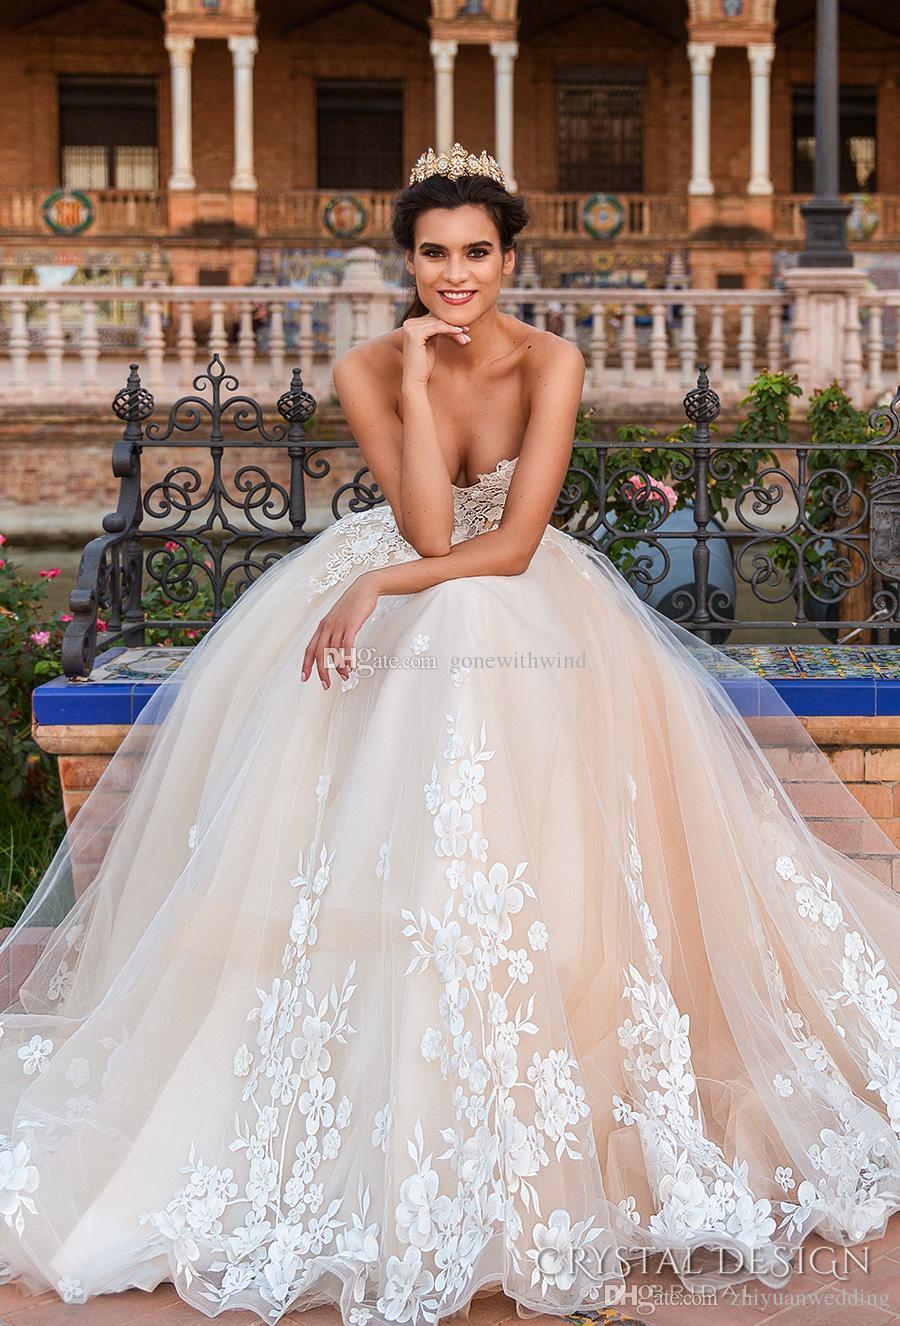 Corset Princess Ball Gown Wedding Dresses 2017 Crystal Design Bridal ...